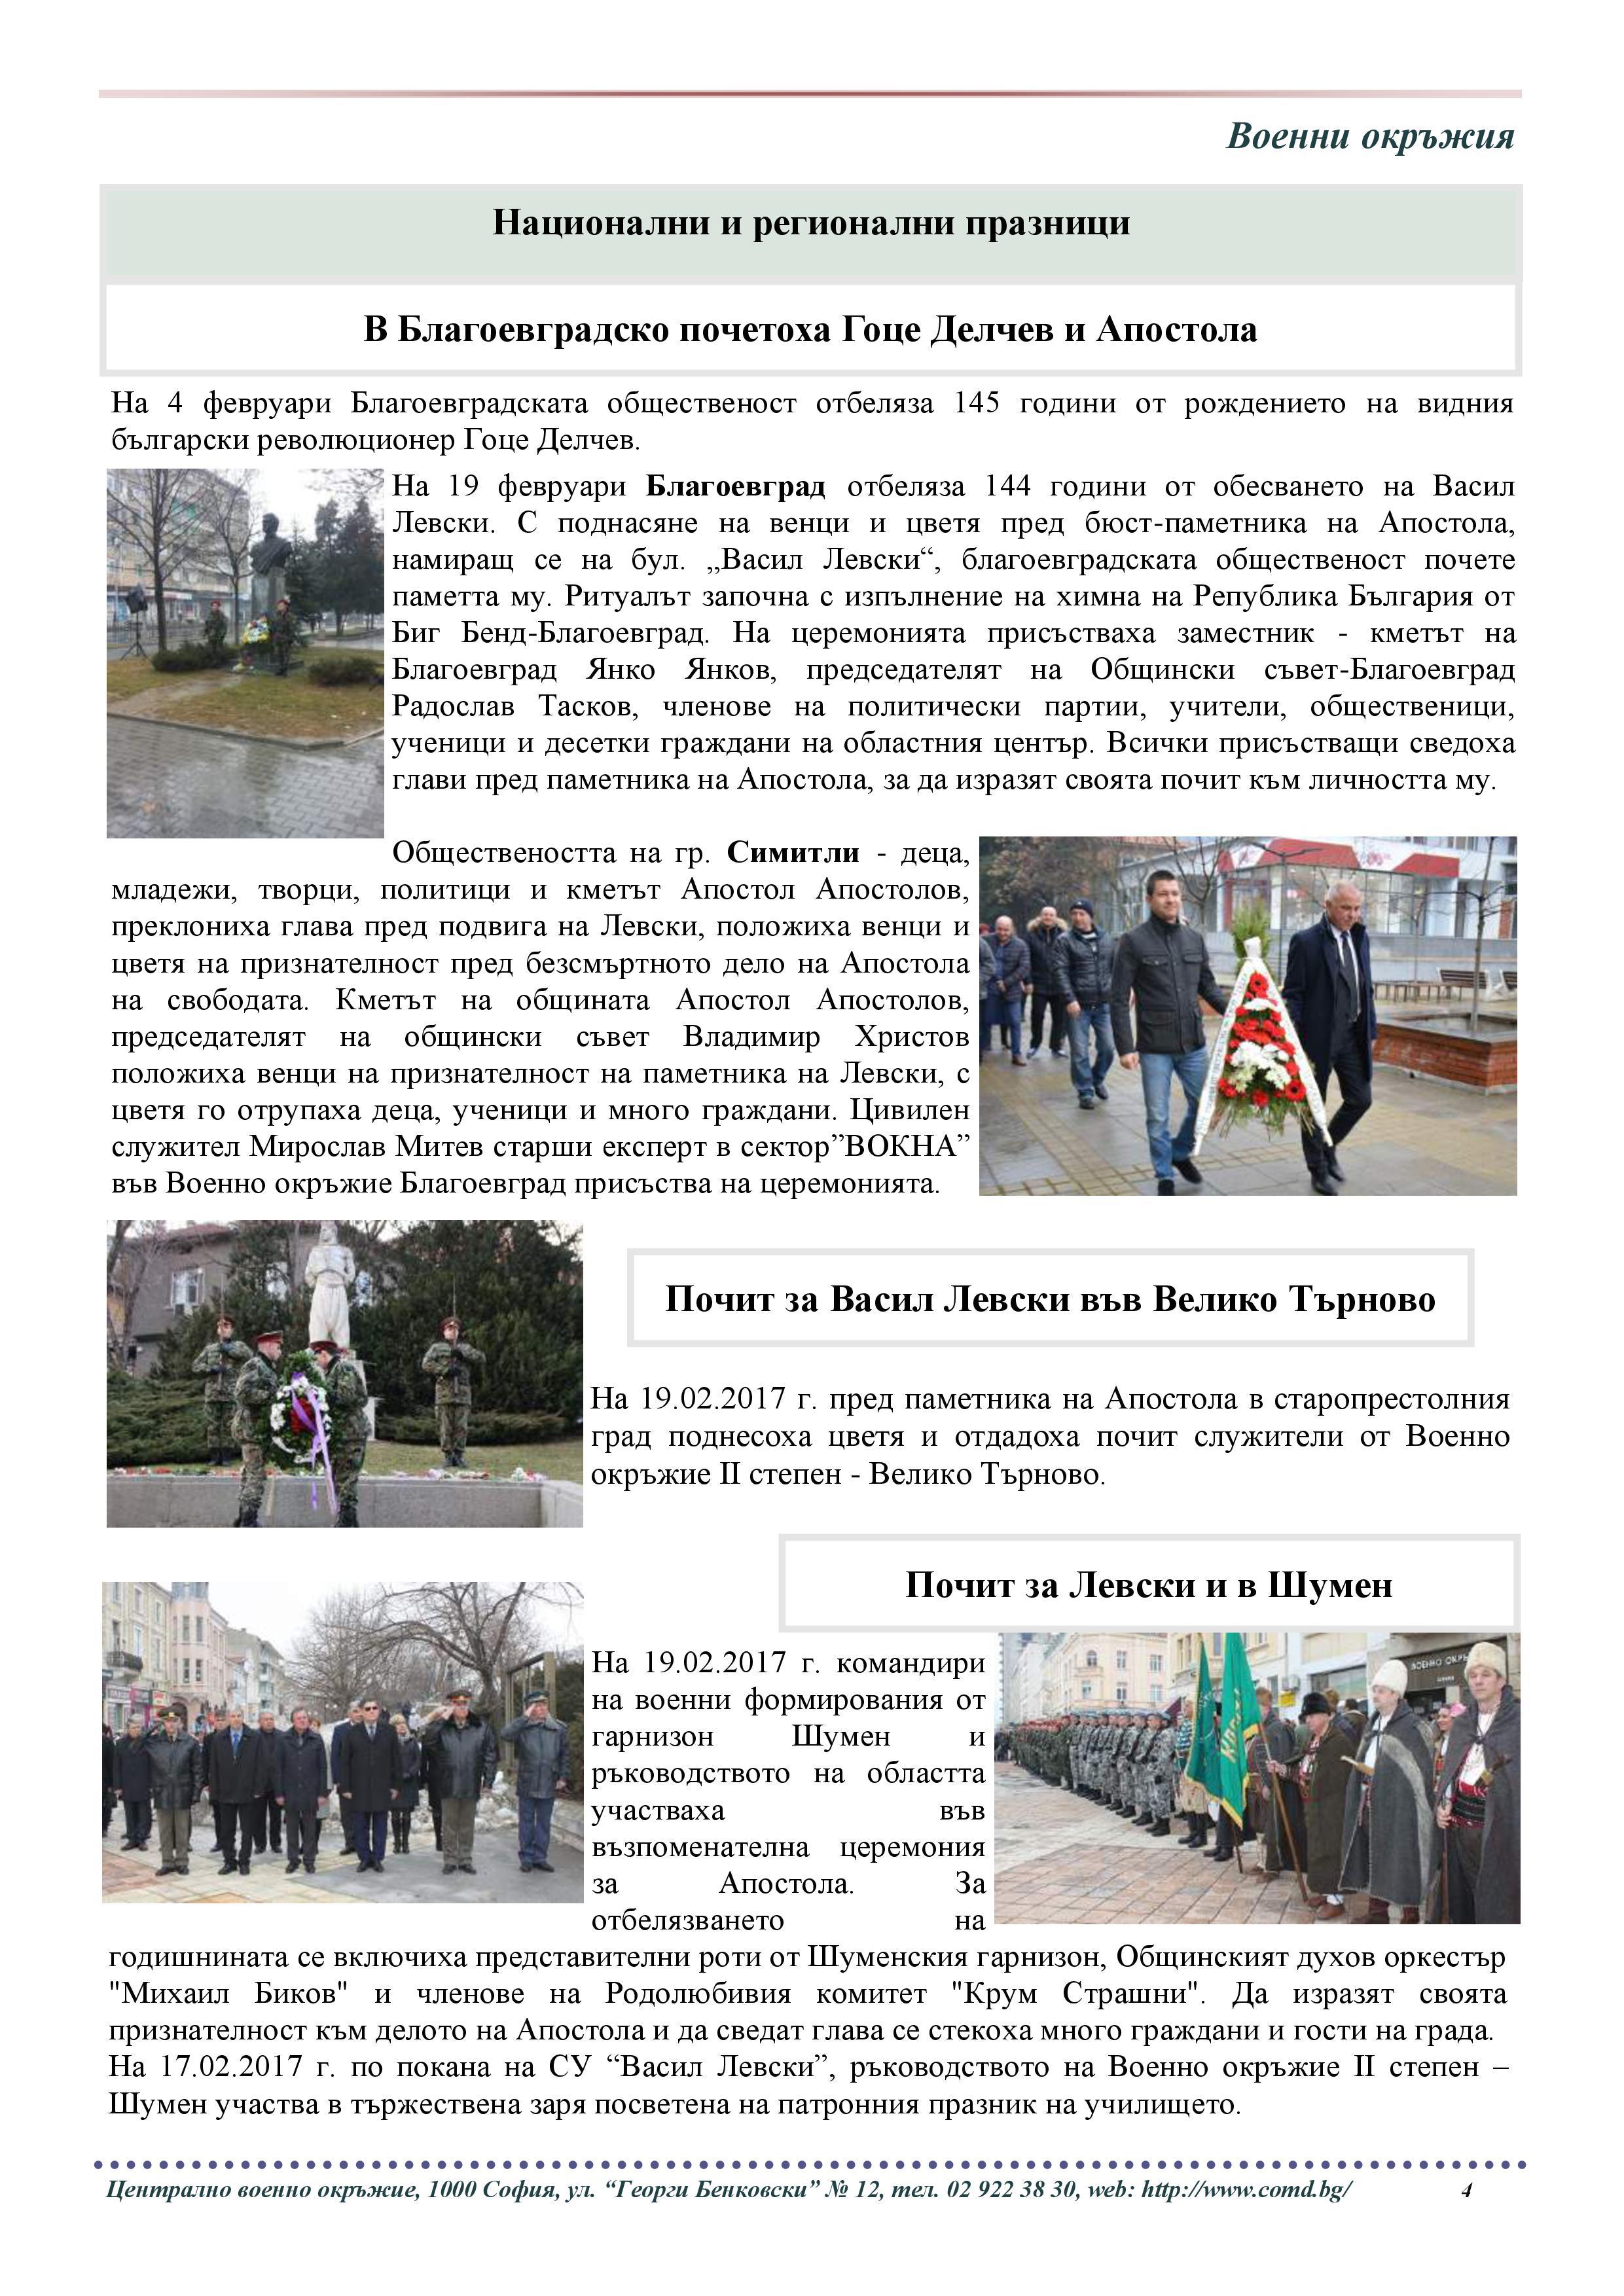 http://armymedia.bg/wp-content/uploads/2015/06/IB_2_2017g.compressed-za-izpra6tane-22.03.2017.page04.jpg